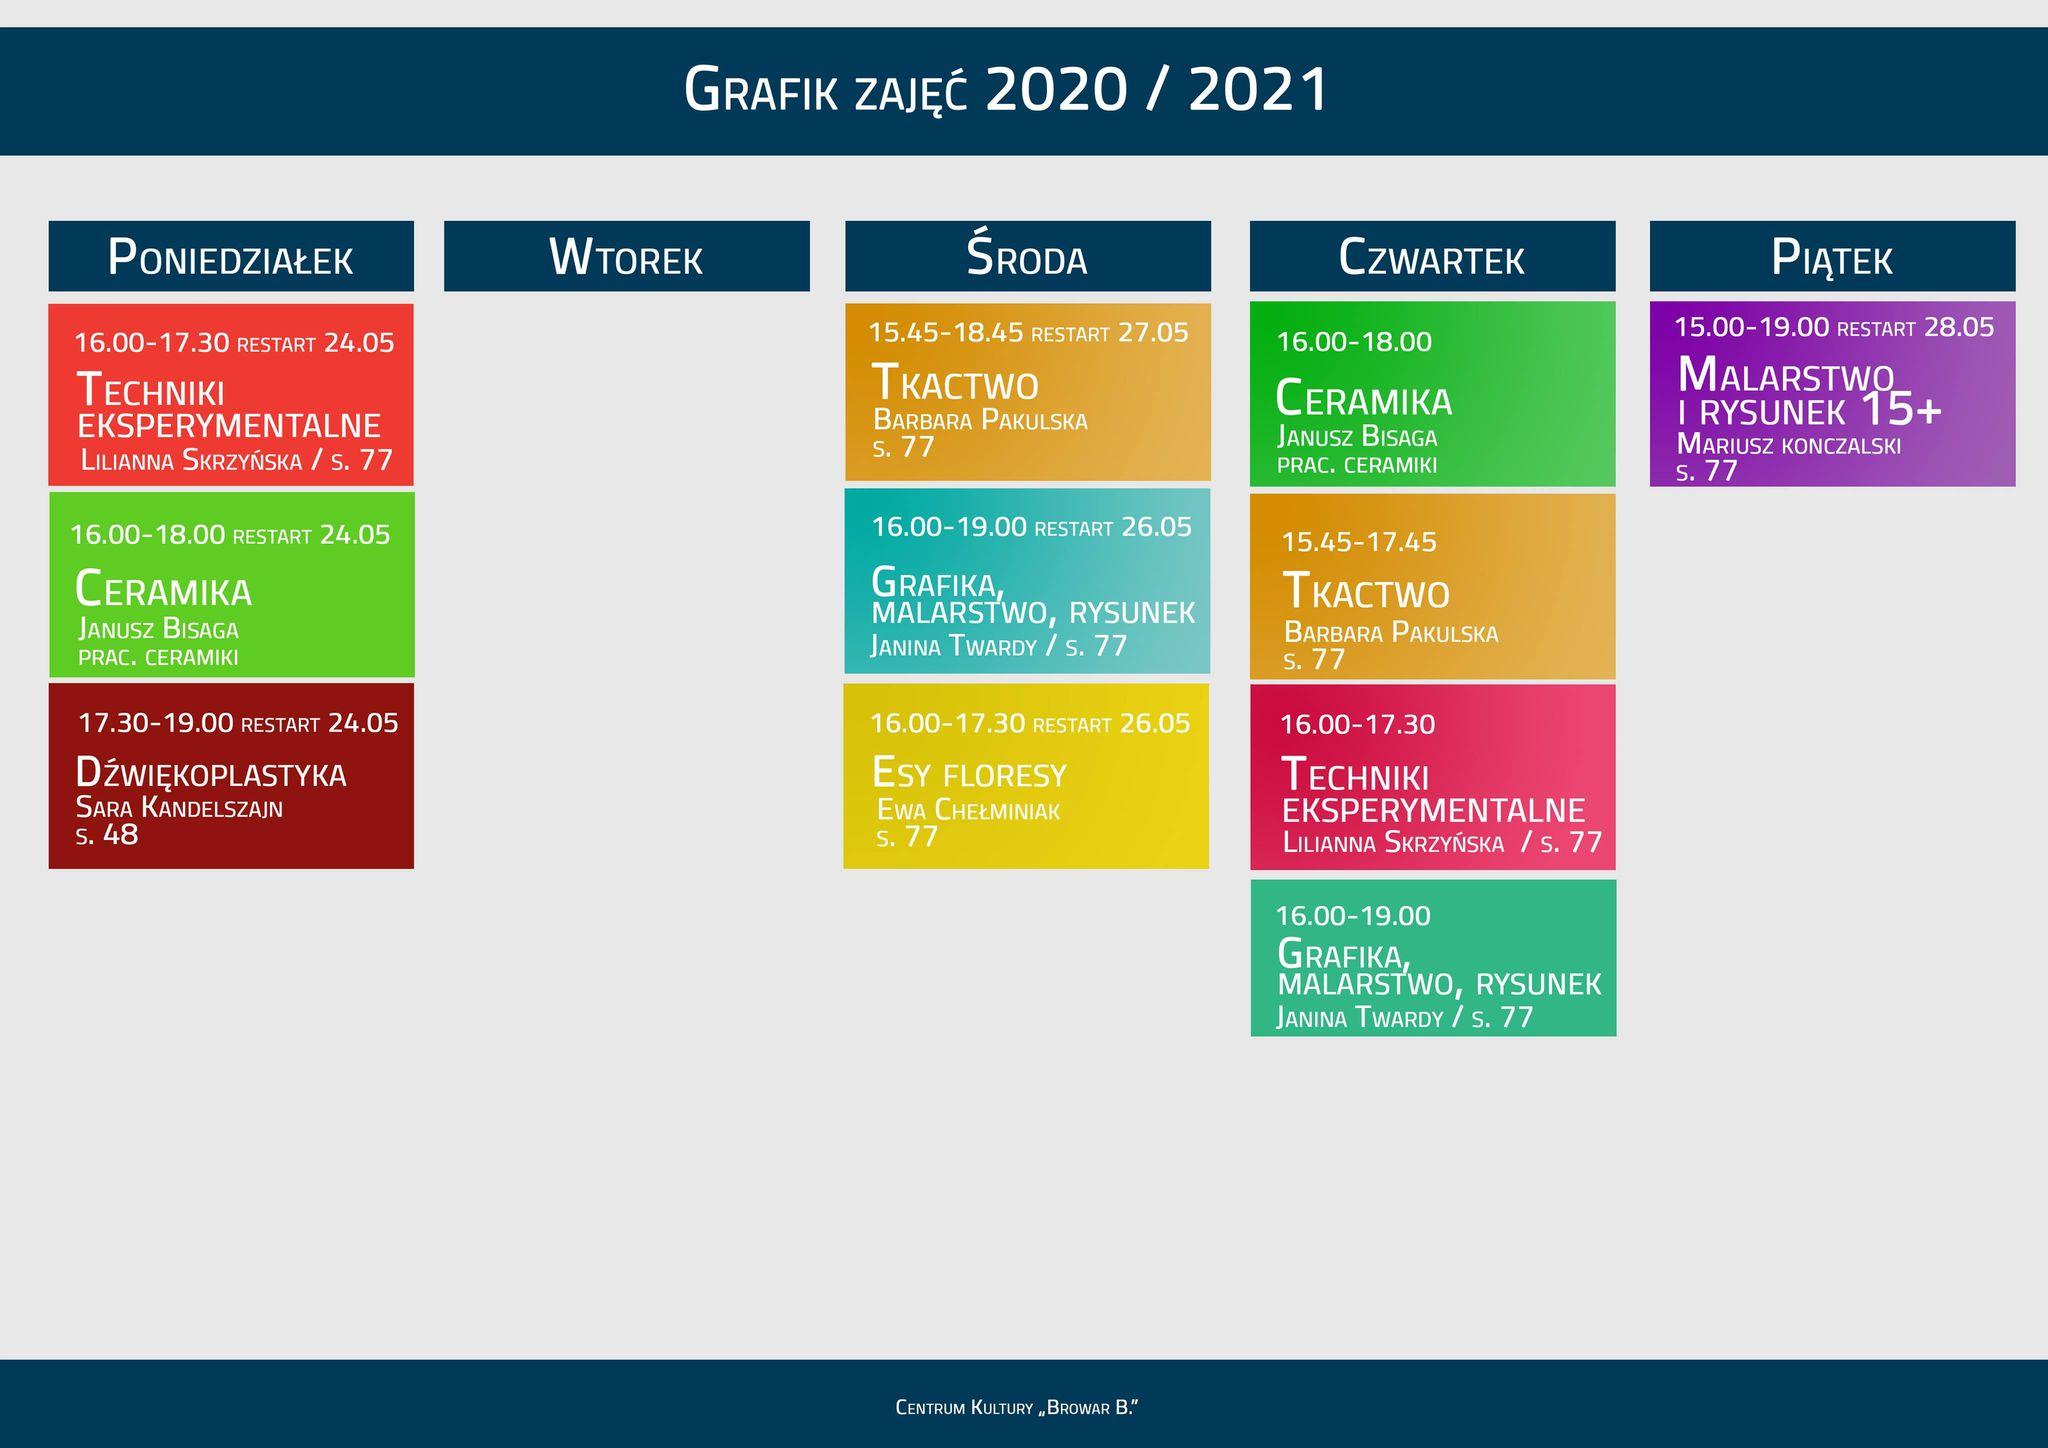 GRAFIK ZAJEC PEP 2020-21_maj czerwiec_restart